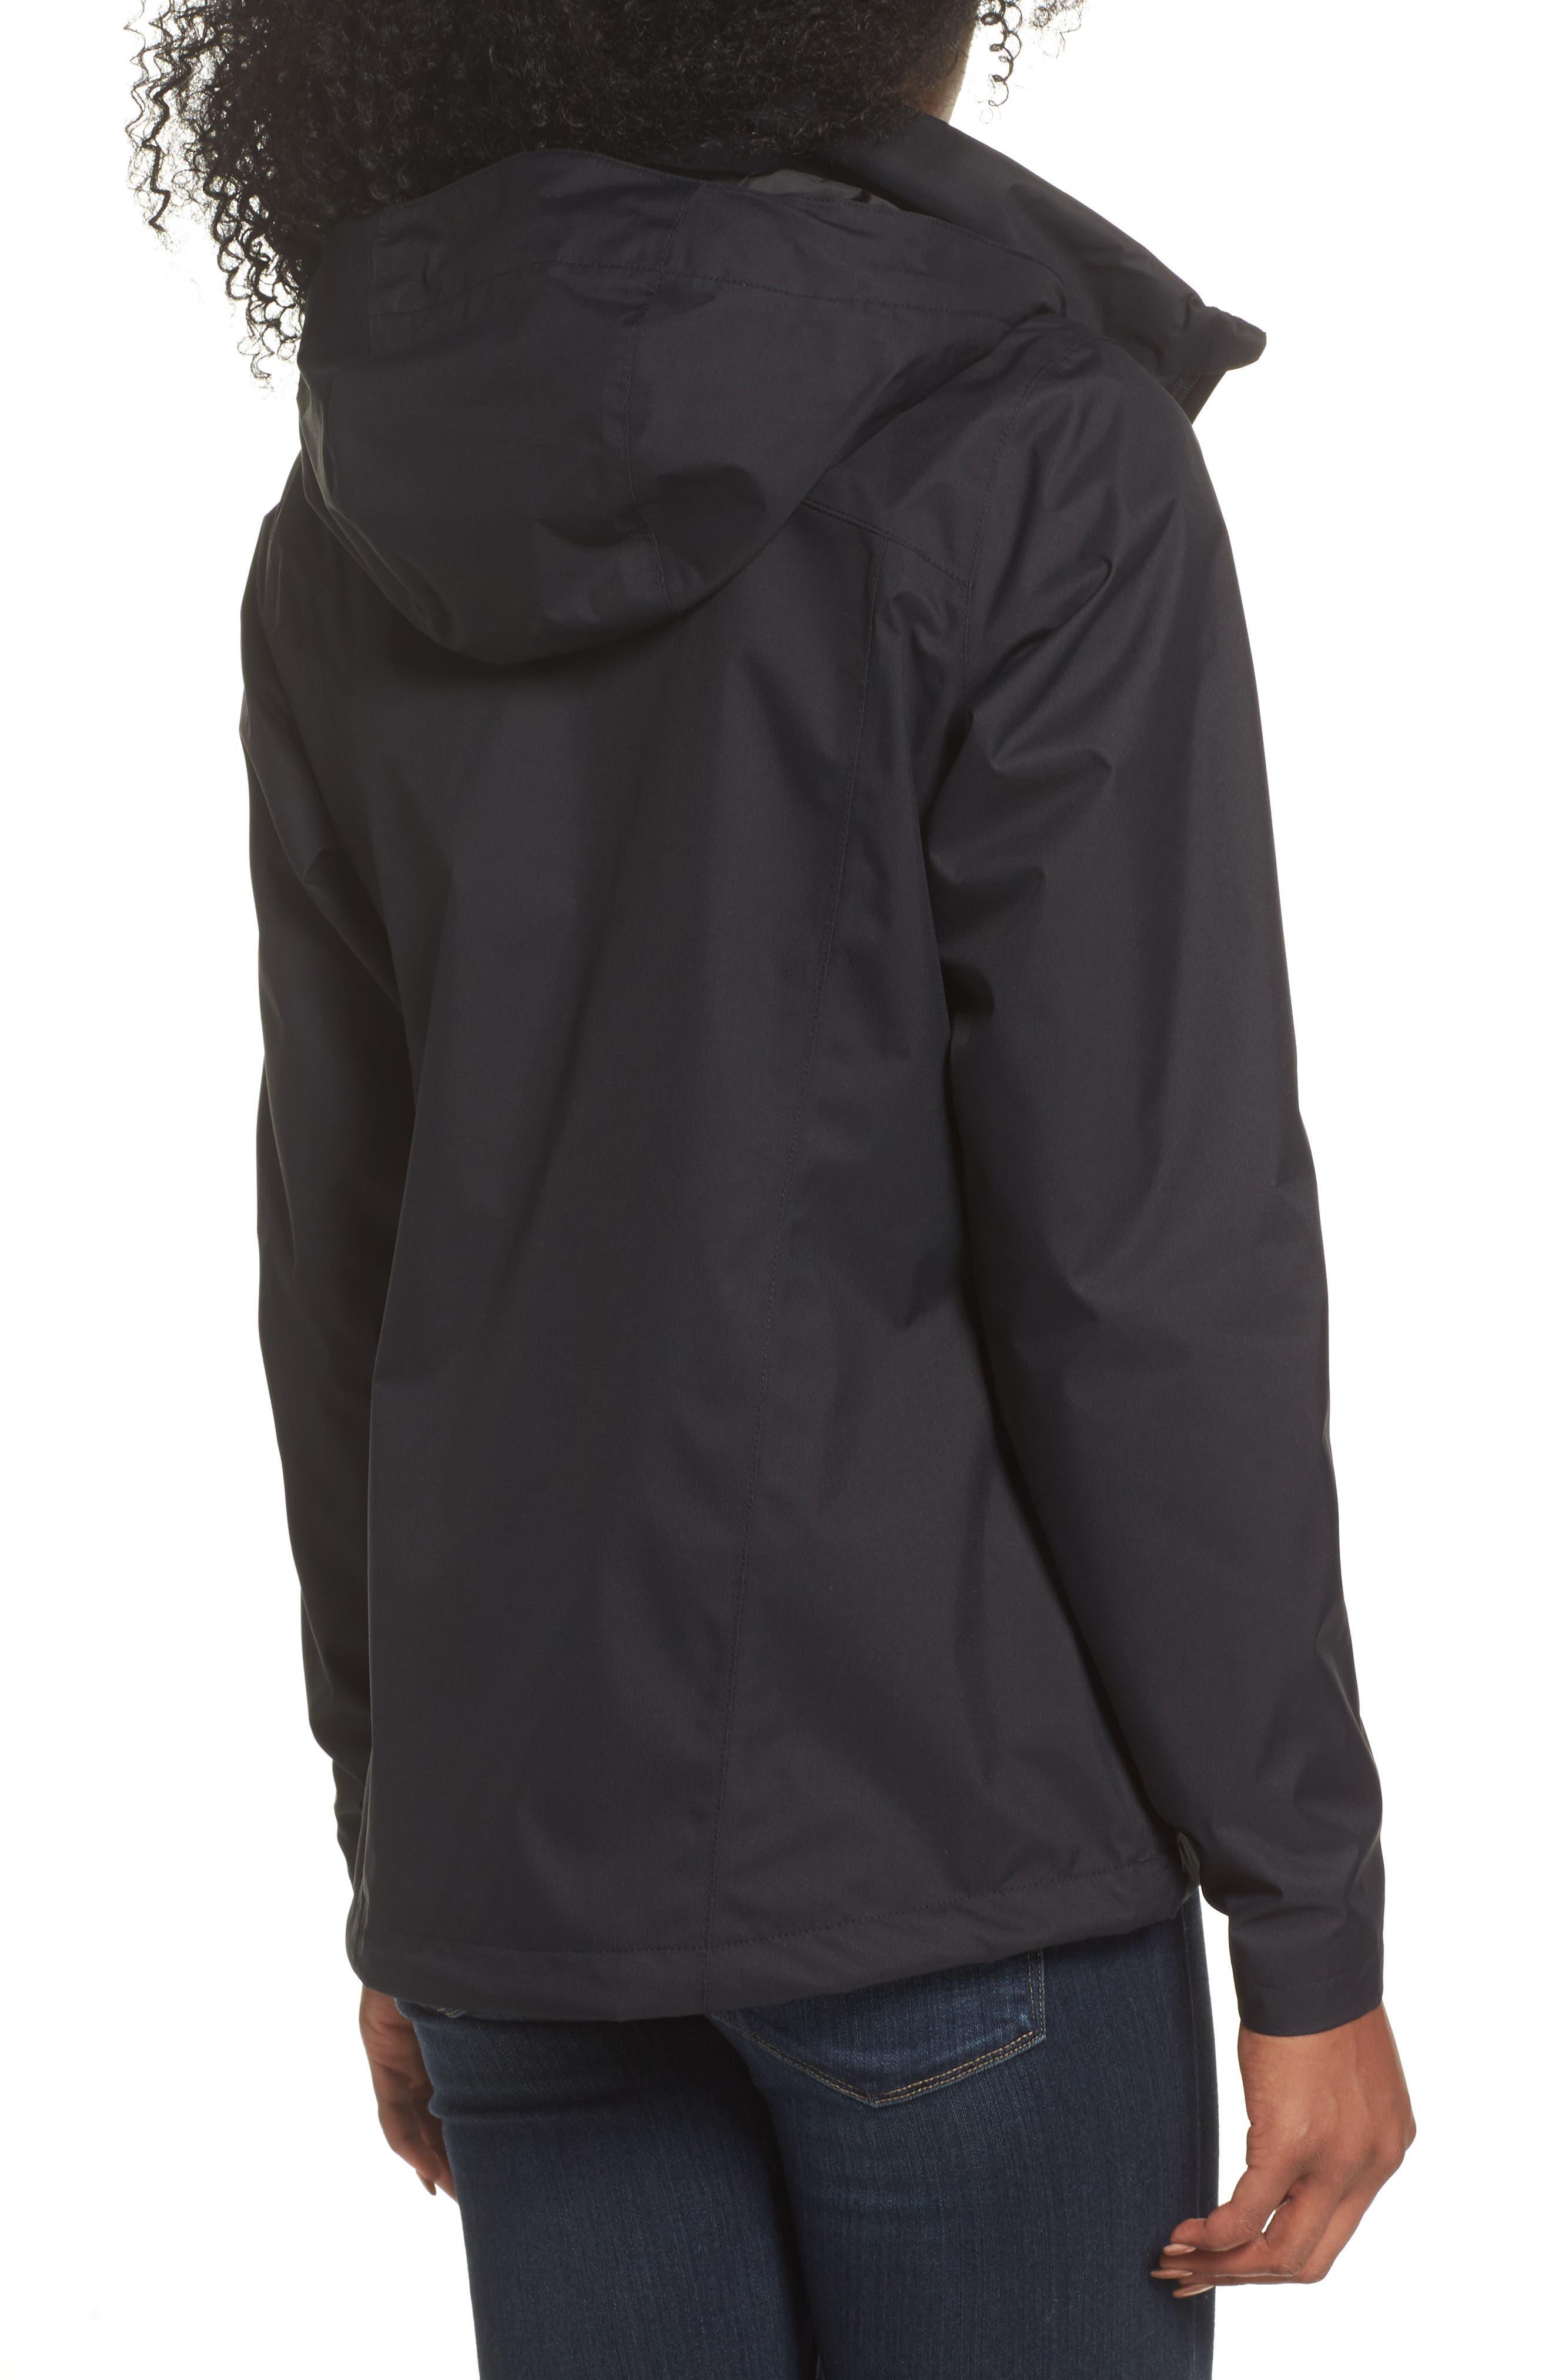 'Resolve Plus' Waterproof Jacket,                             Alternate thumbnail 2, color,                             Tnf Black